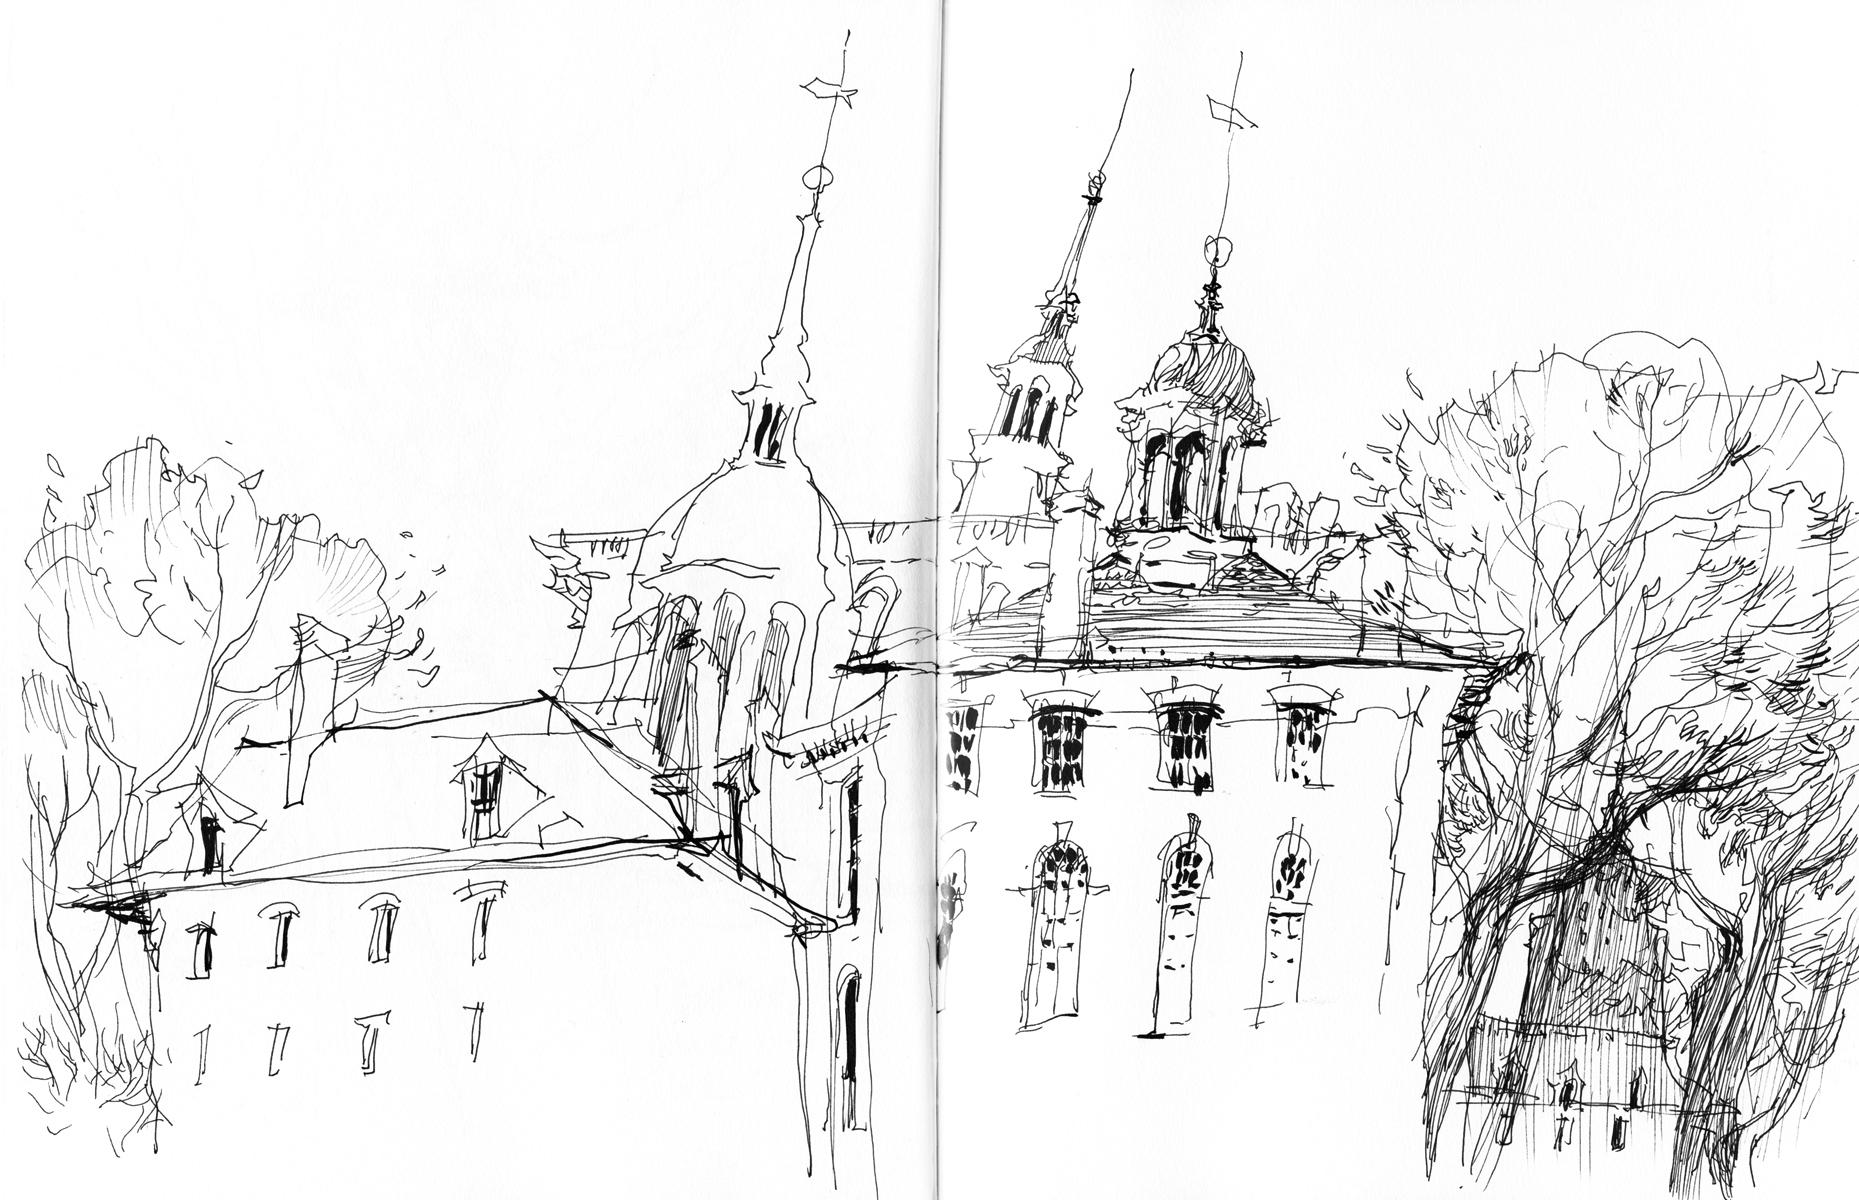 sketch of philadelphia by marc taro holmes